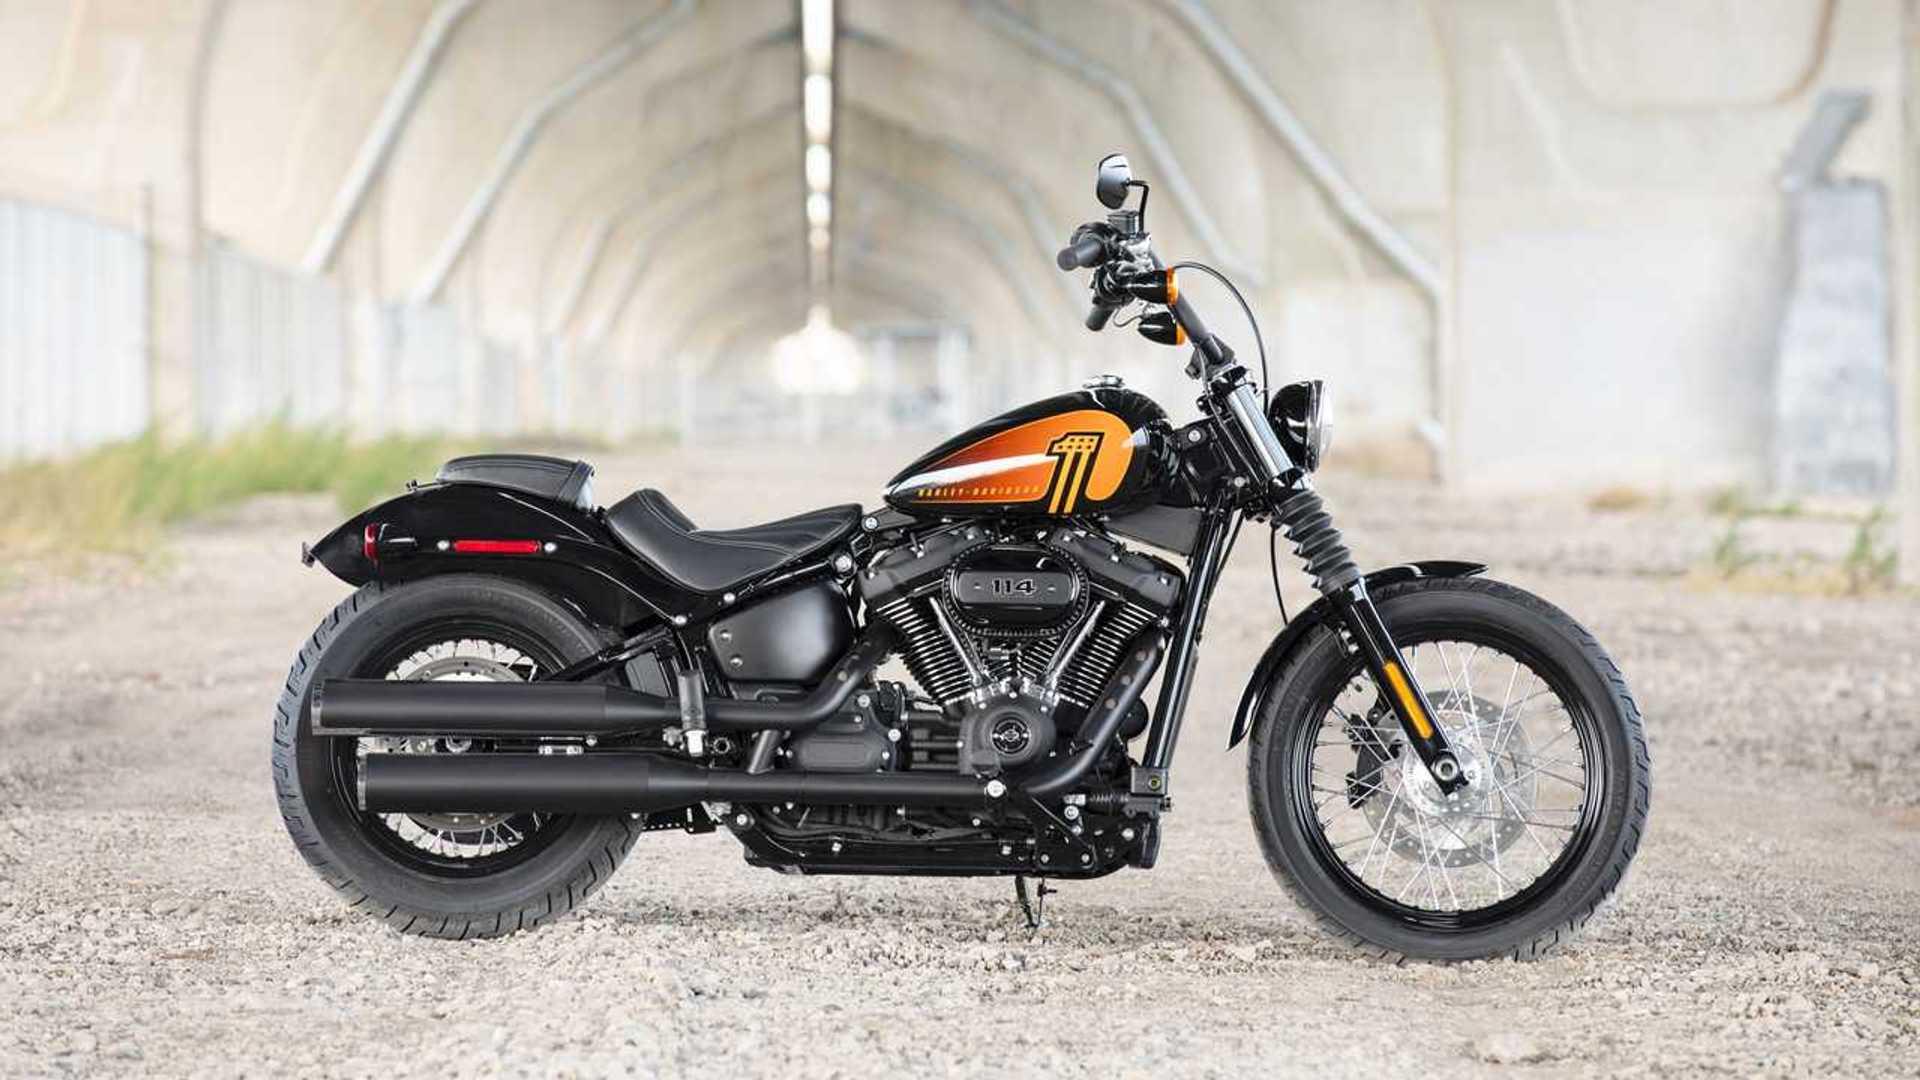 Harley-Davidson Confirms 2021 Softail, Touring, And CVO Lineup